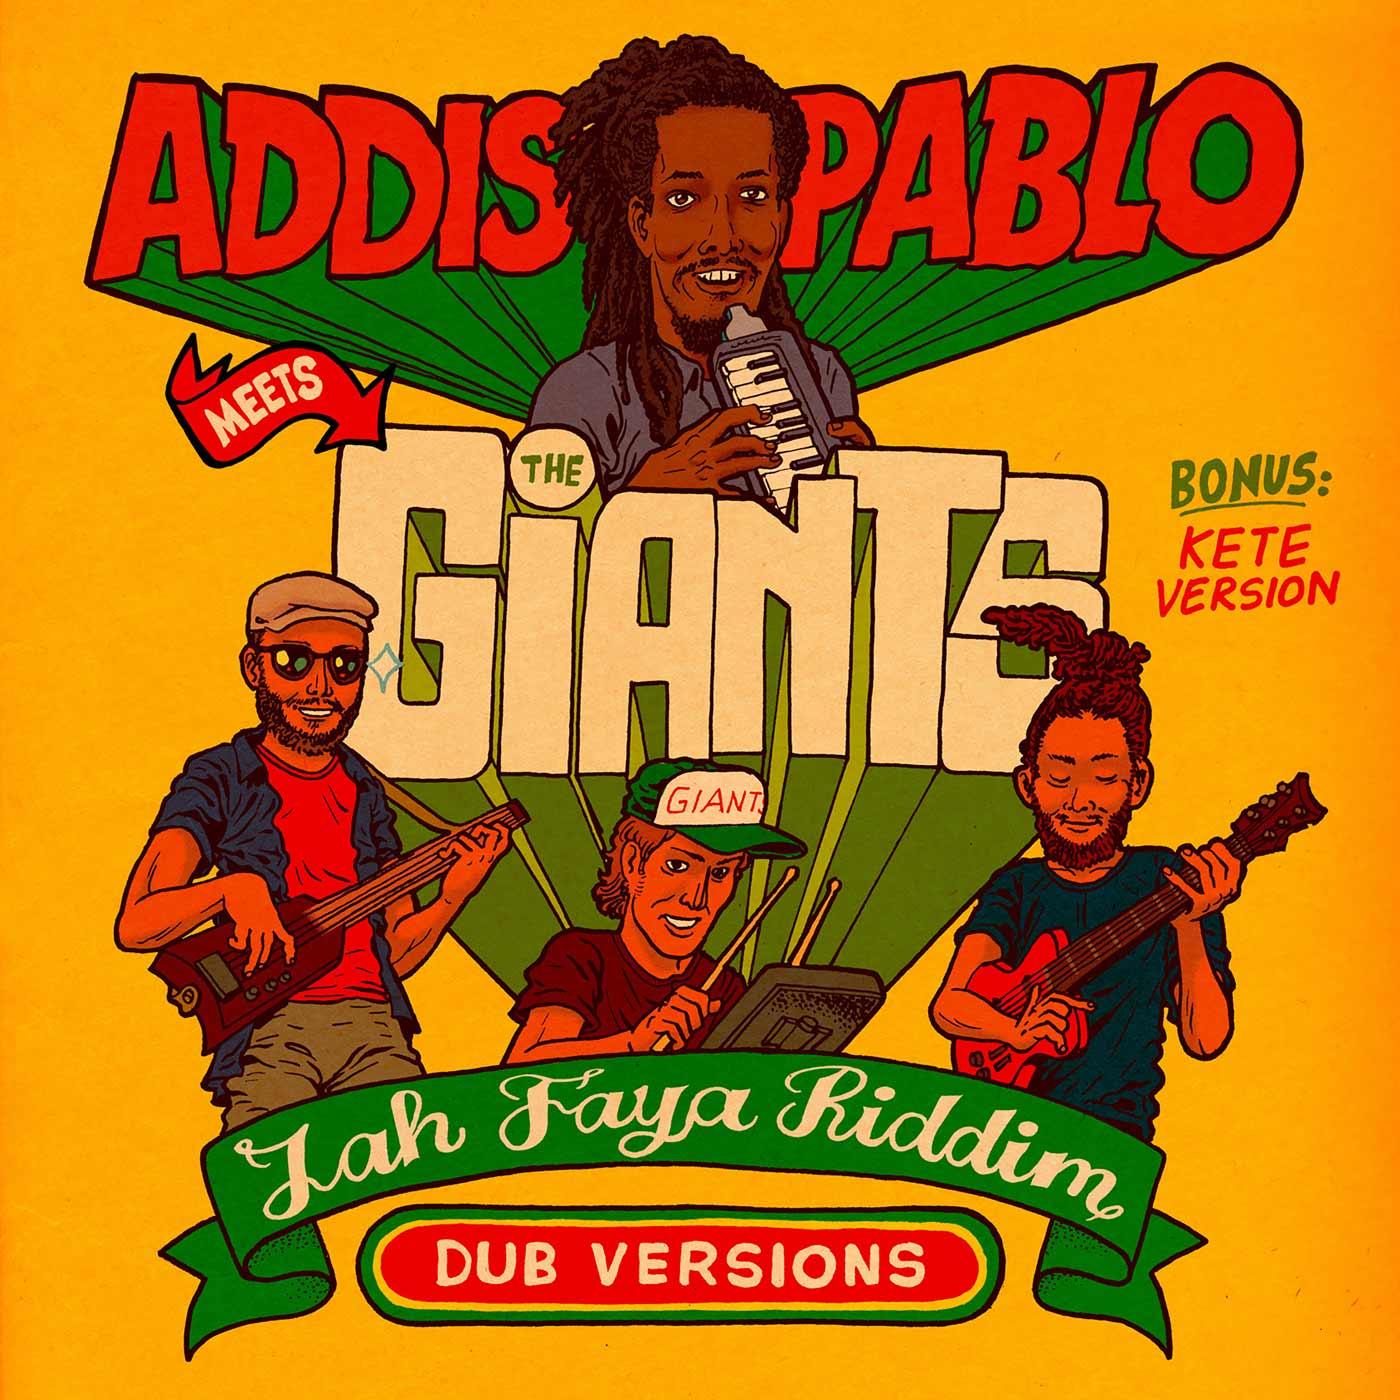 Addis Pablo meets The Giants - Jah Faya Riddim | Reggae Roots Dub